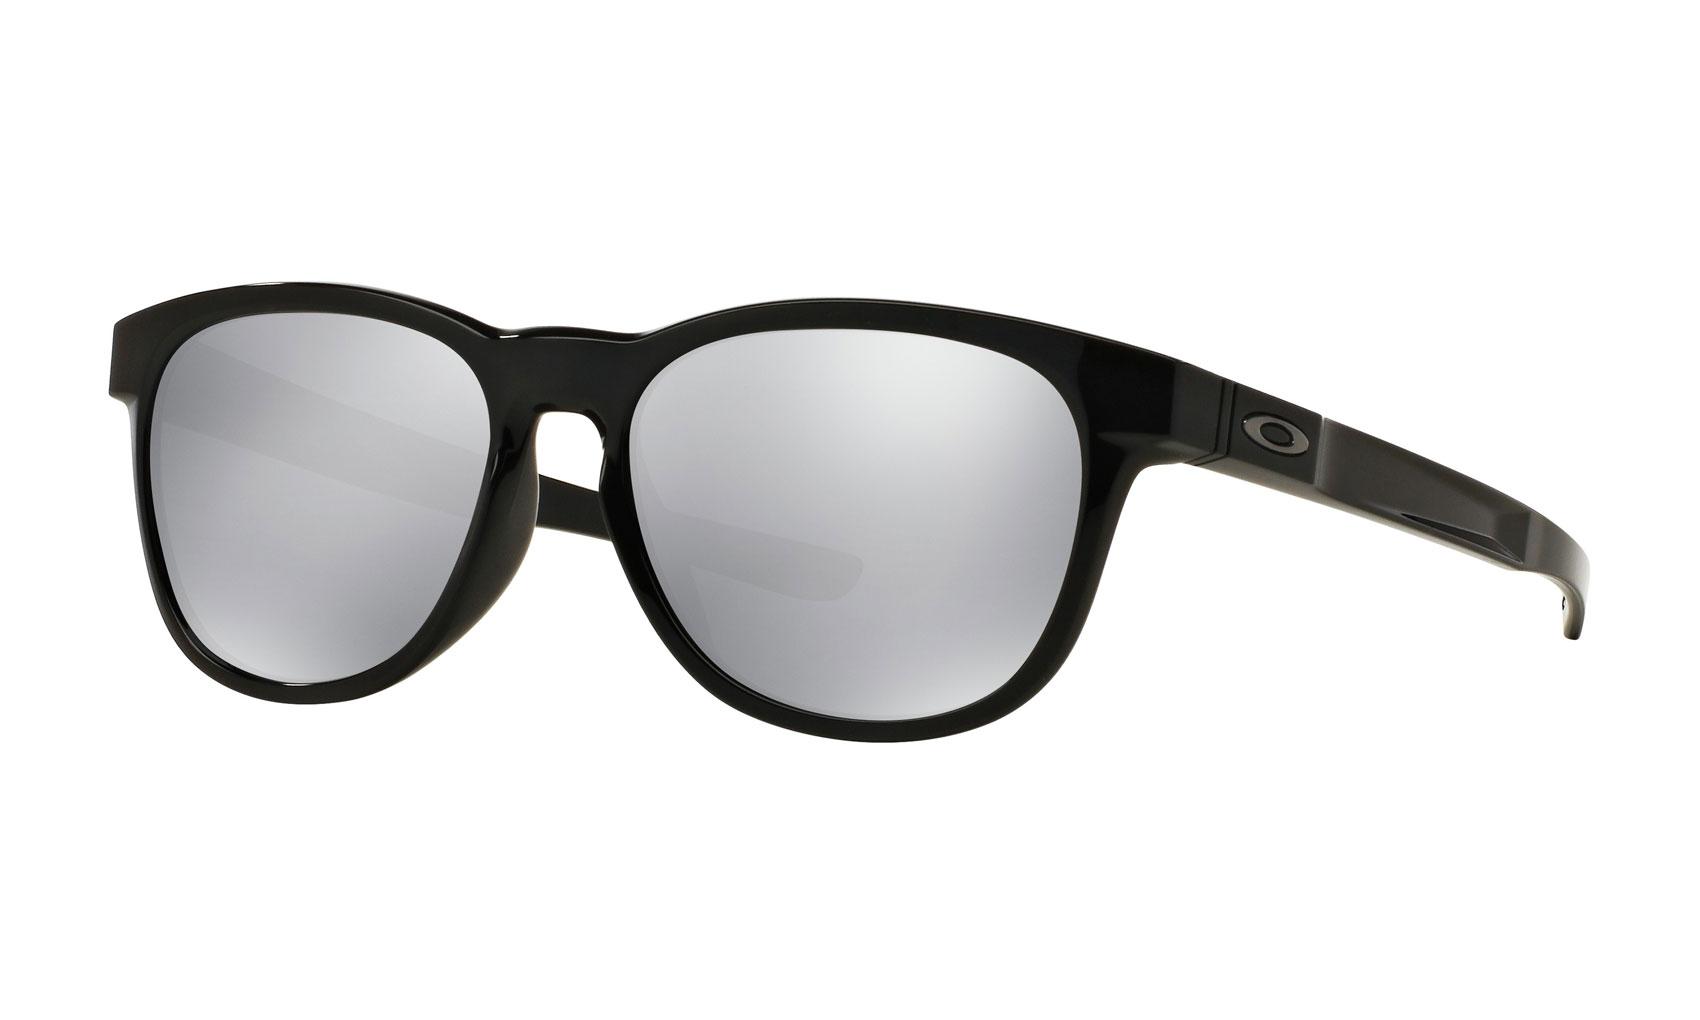 3323ffc3e8 Oakley Stringer Sunglasses Polished Black Chrome Iridium ...